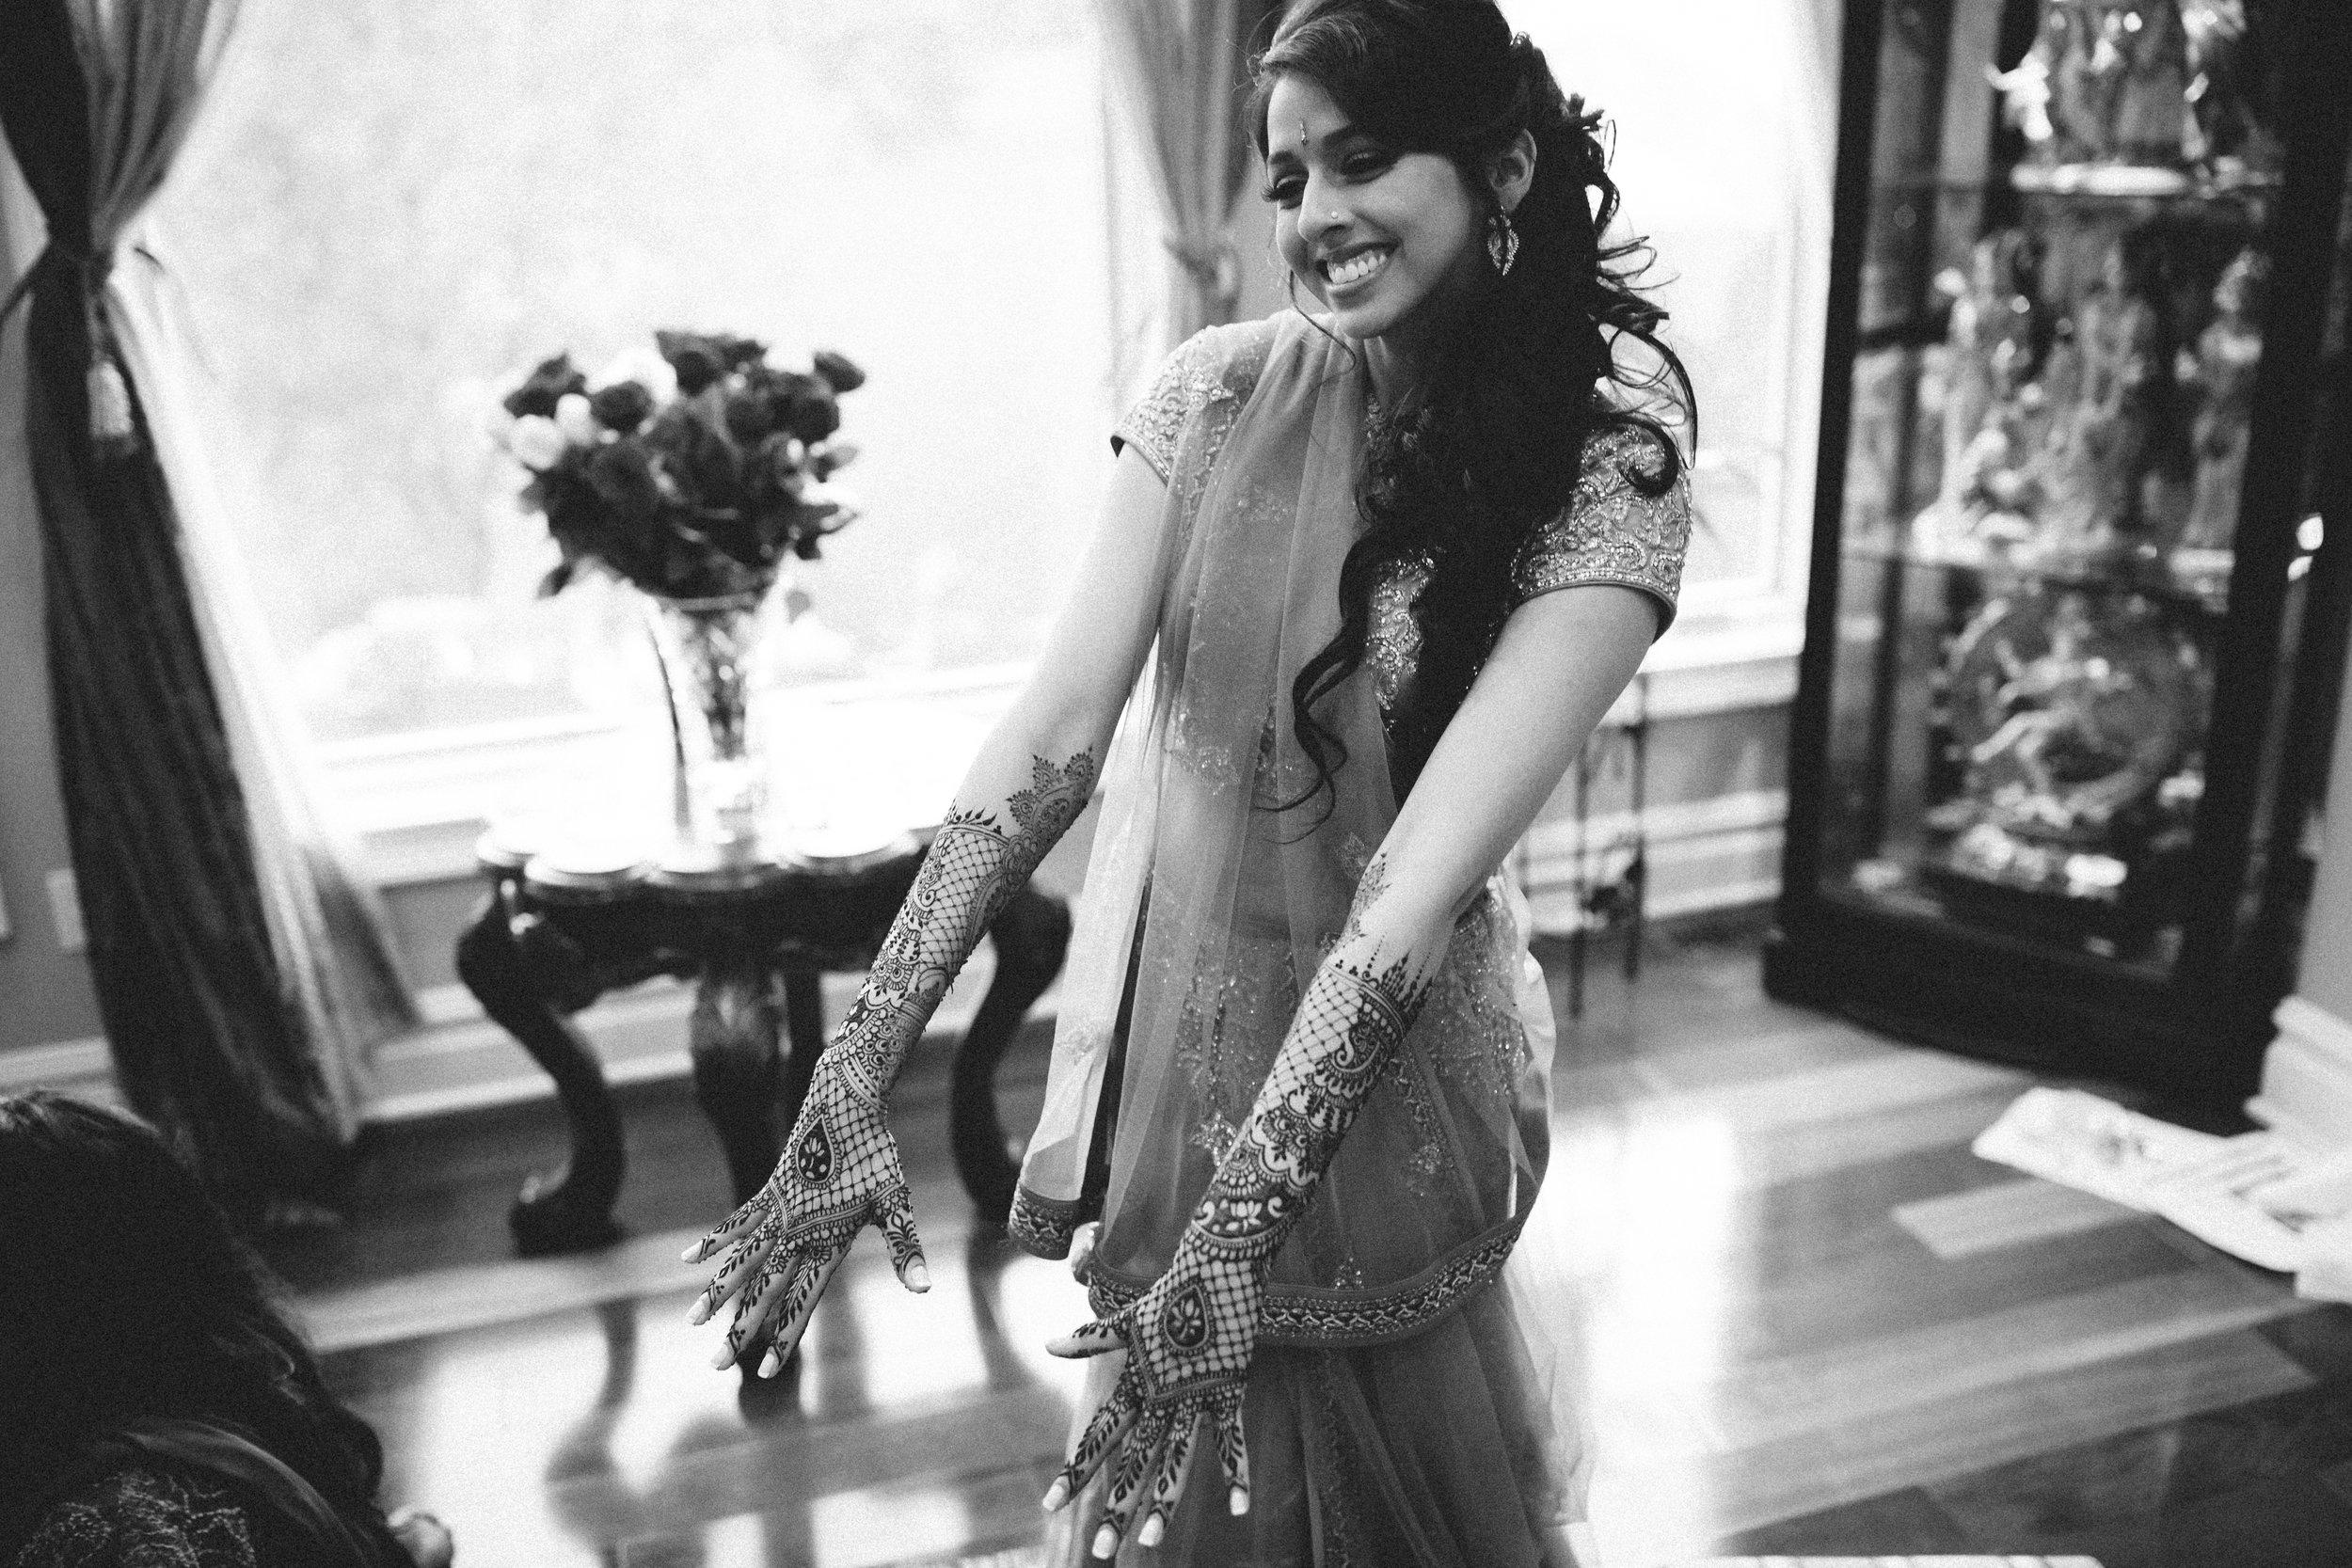 Aparna-Ankit-Patel-Mehndi-Wedding-Photos-0068.jpg